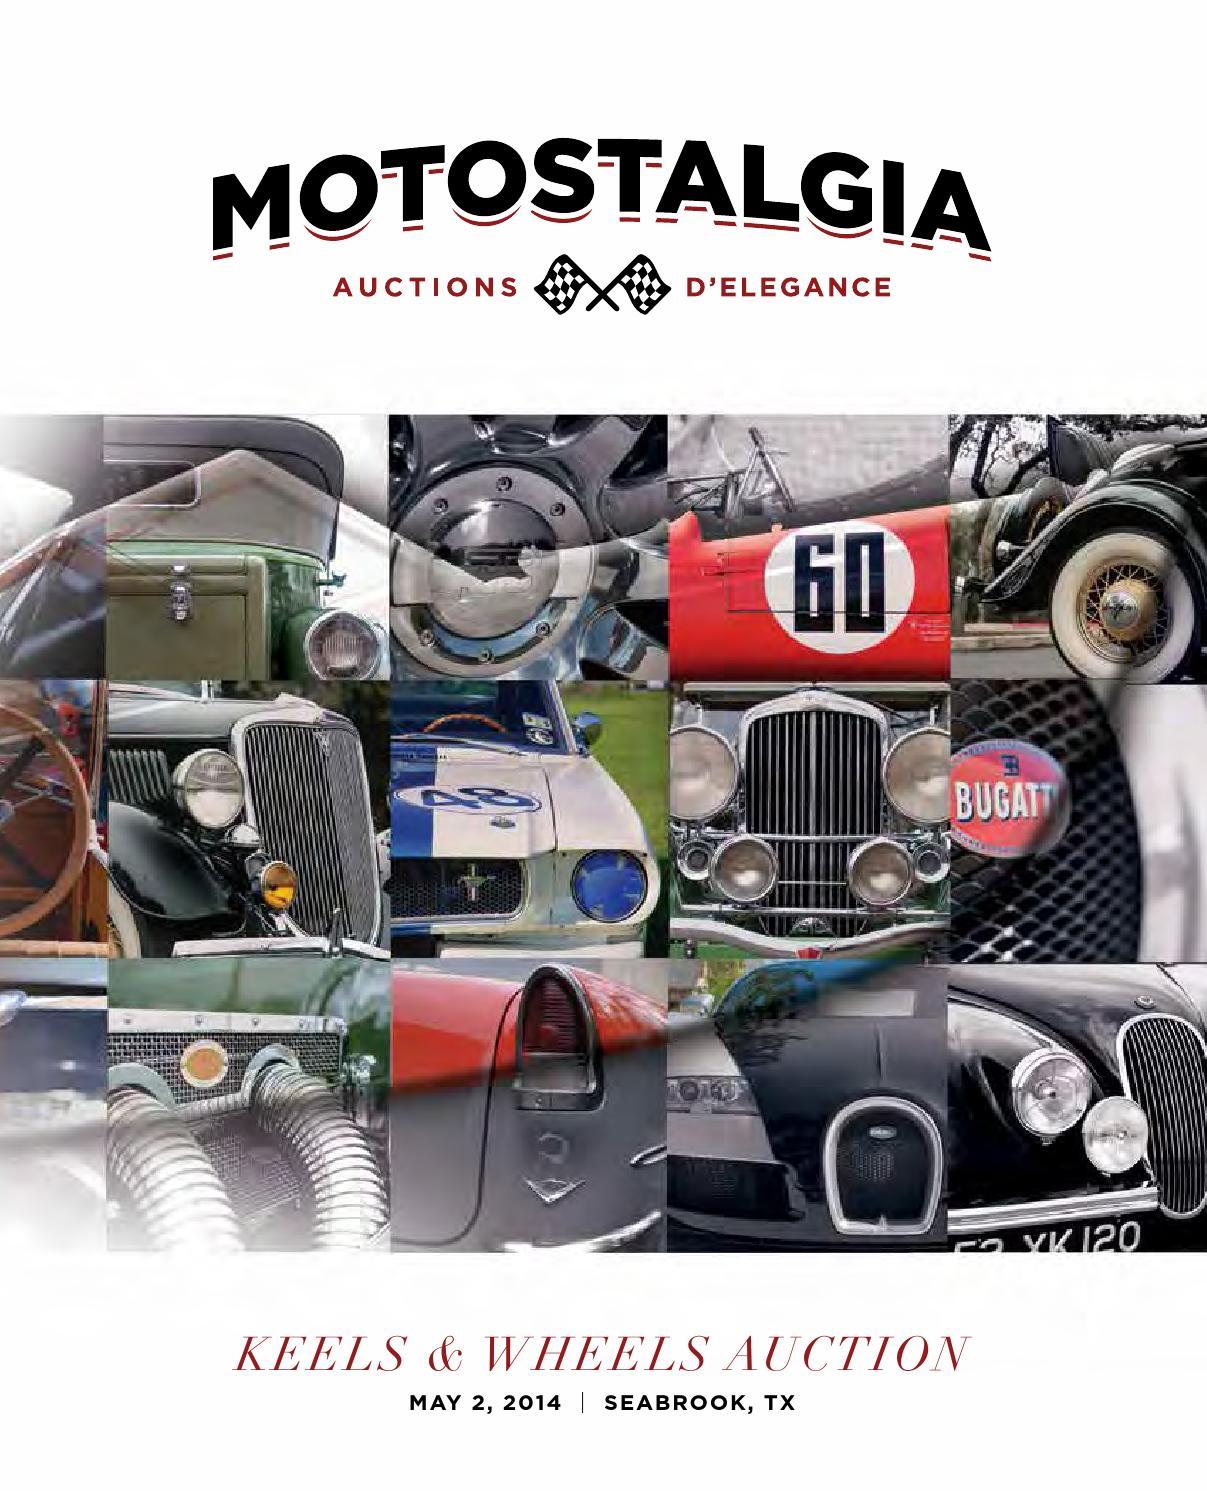 Motostalgia 2014 Keels Wheels Auction Catalog By Issuu Ignition Circuit Diagram For The 1955 Nash 8 Cylinder Ambassador